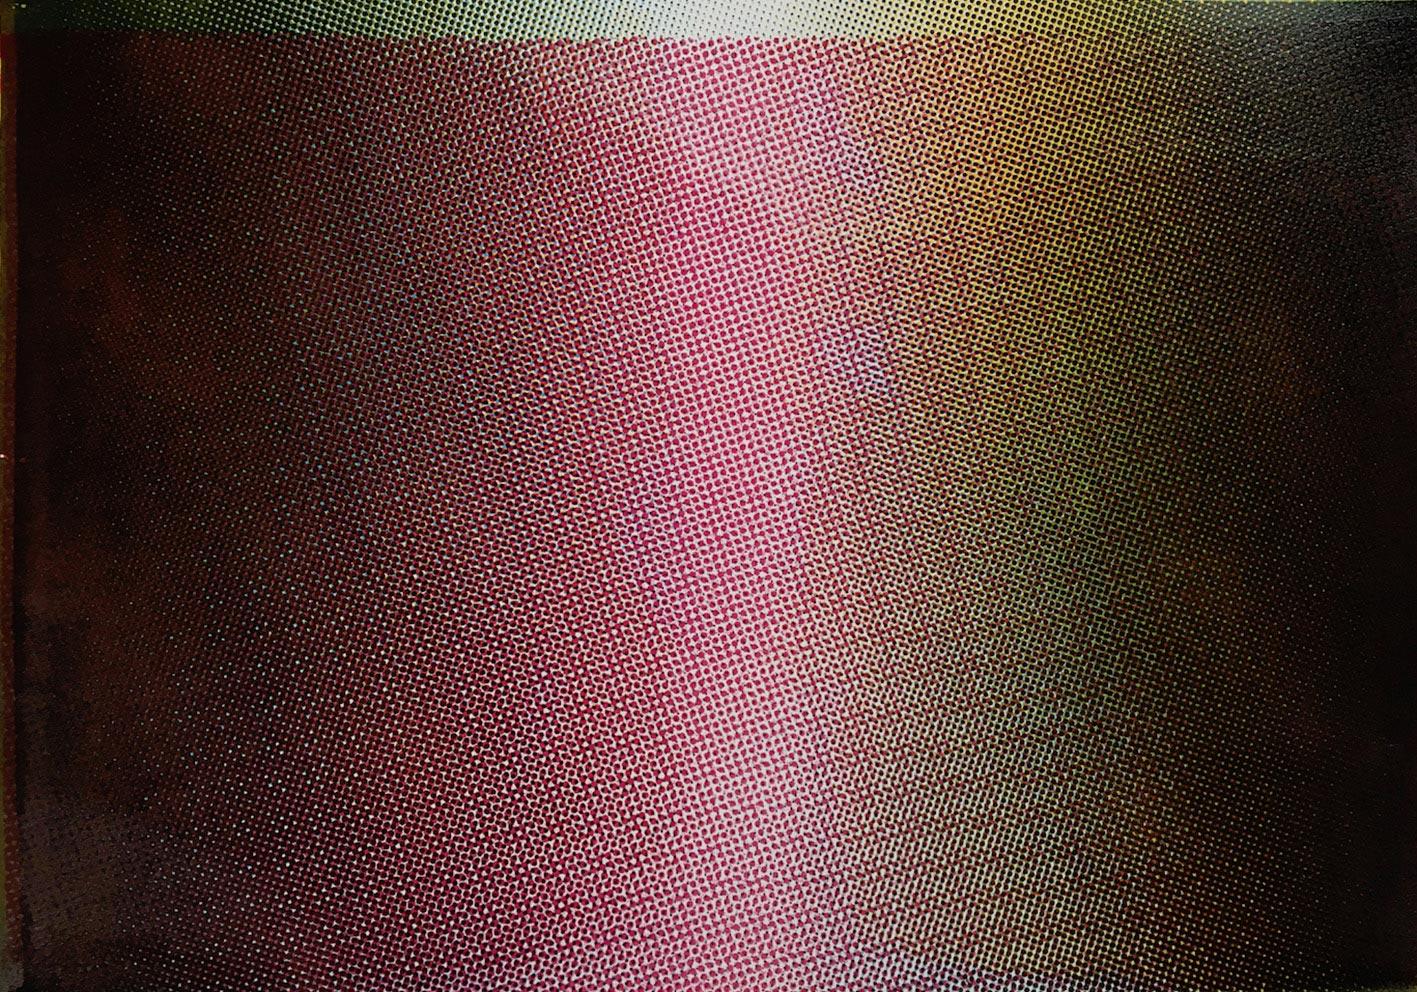 half_tone_gradient 0188w.jpg